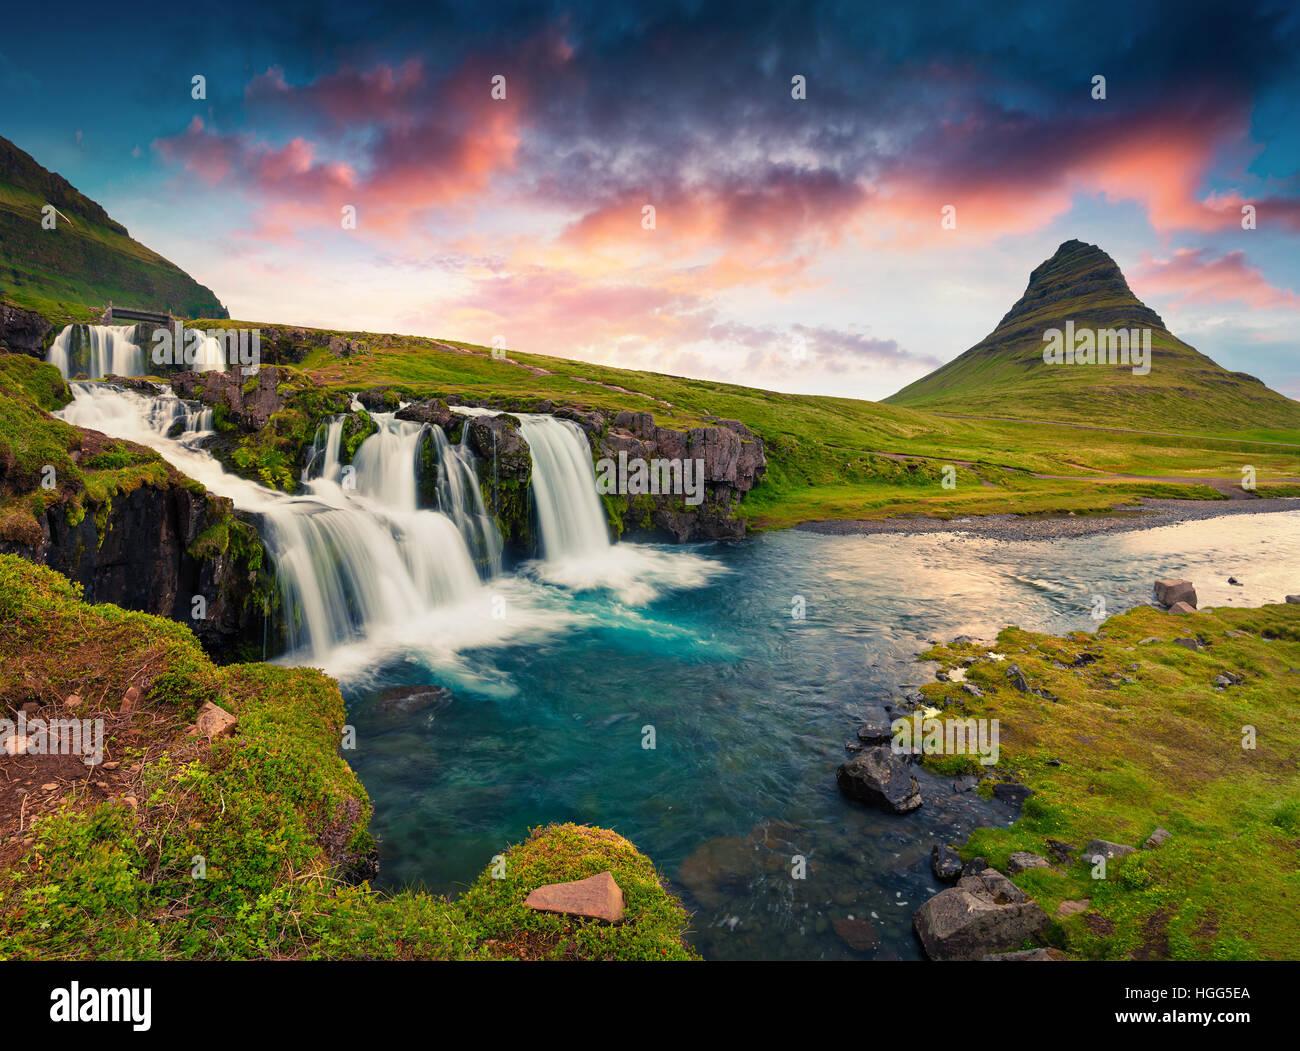 Sommer Sonnenuntergang am berühmten Kirkjufellsfoss Wasserfall und Kirkjufell Berg. Farbenfrohe Abendstimmung Stockbild